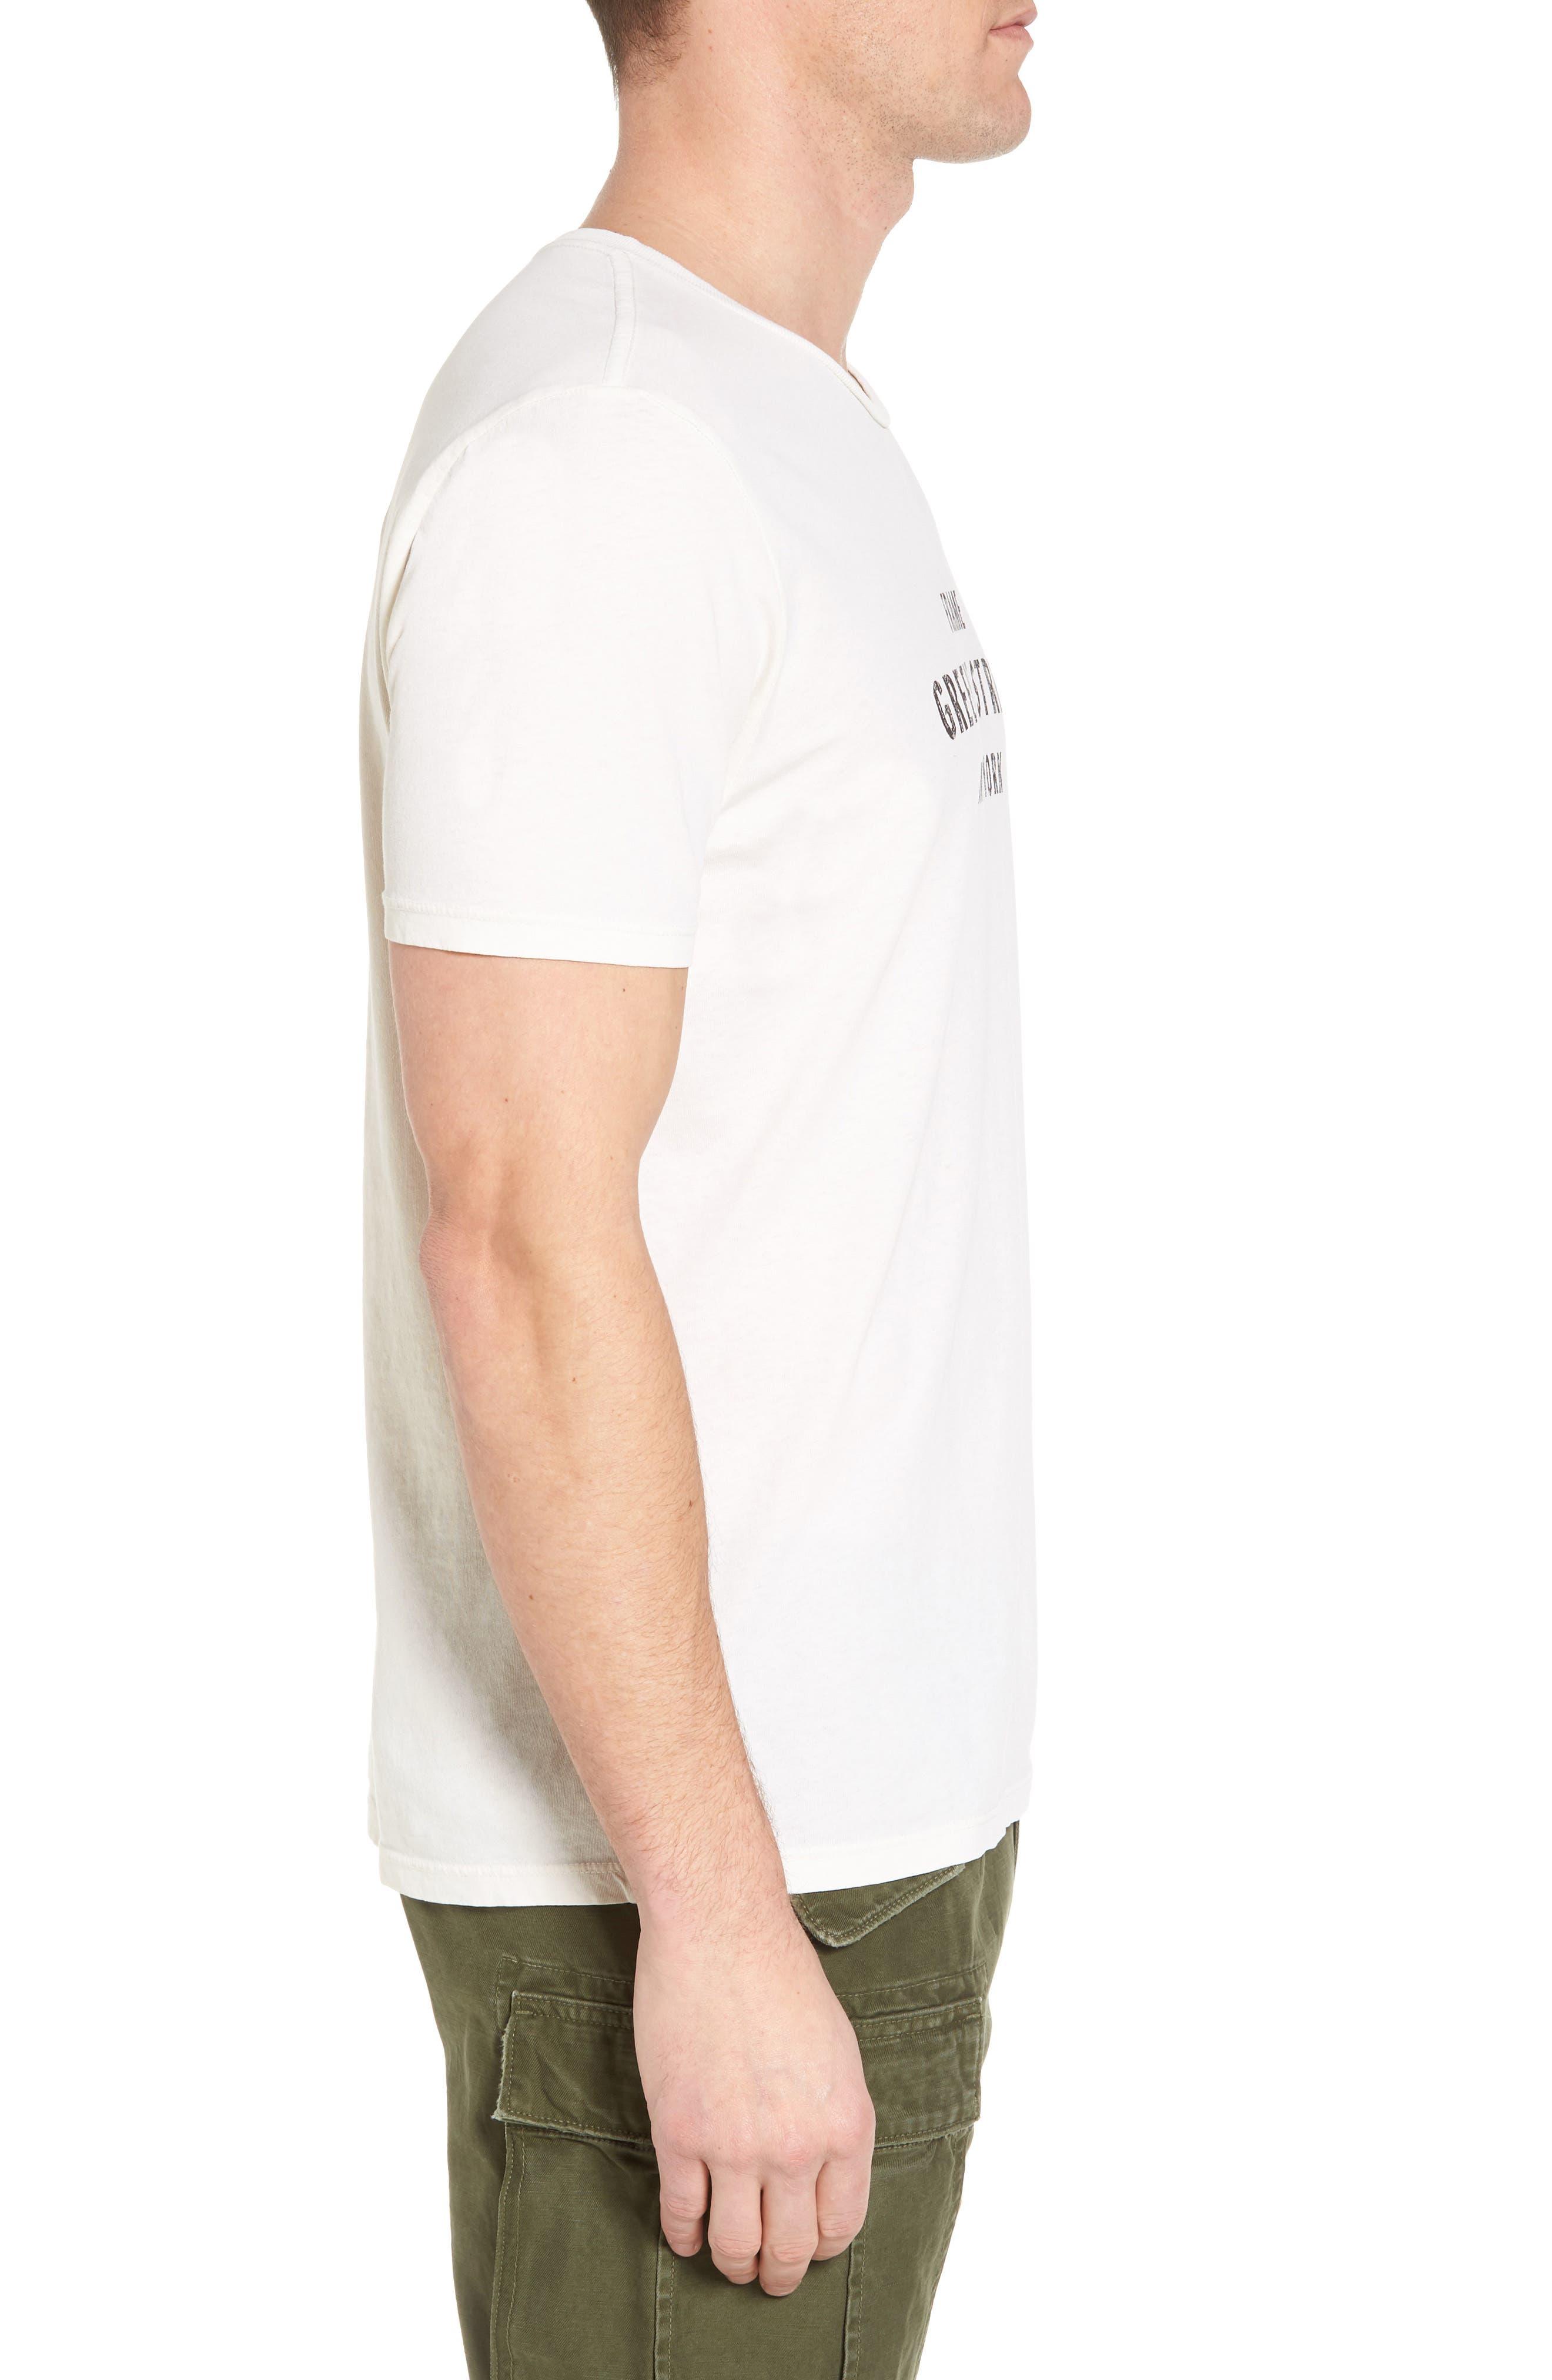 Greene Street Vintage Graphic T-Shirt,                             Alternate thumbnail 3, color,                             Off White